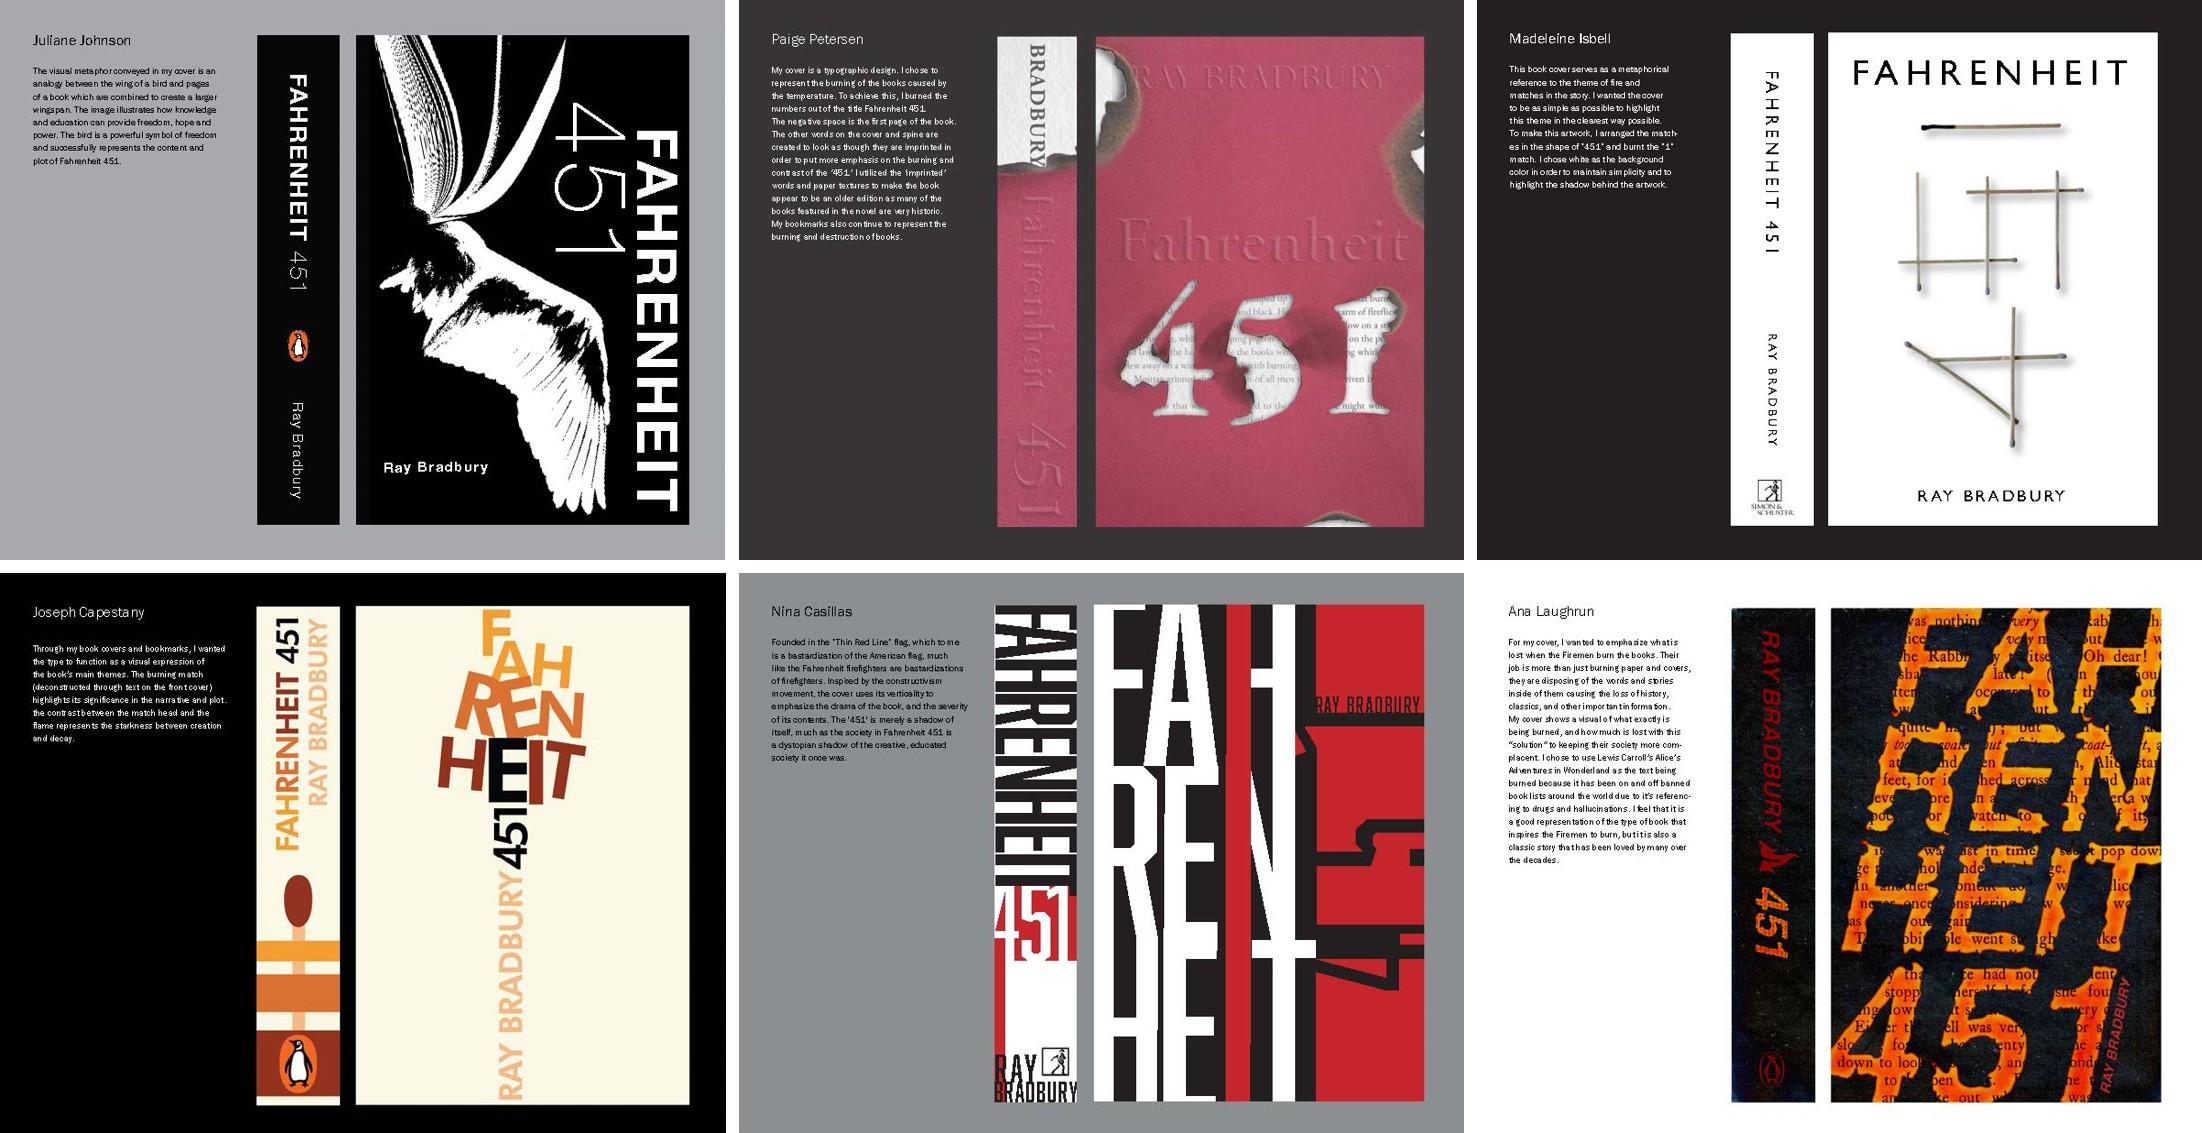 Various interpretations of Farenheit 541 cover